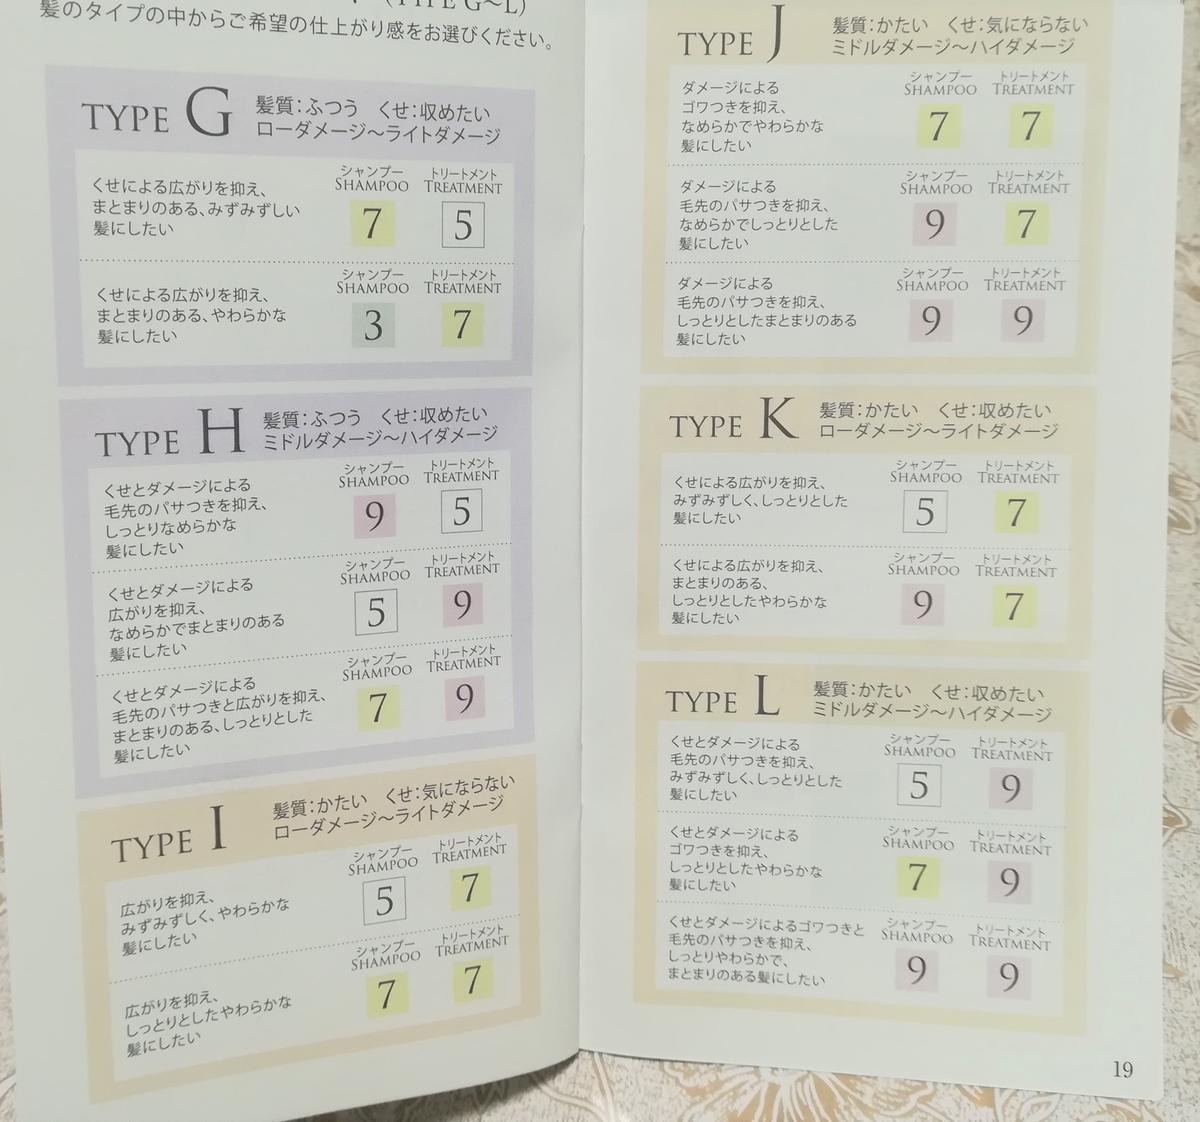 f:id:japantk:20190528101404j:plain